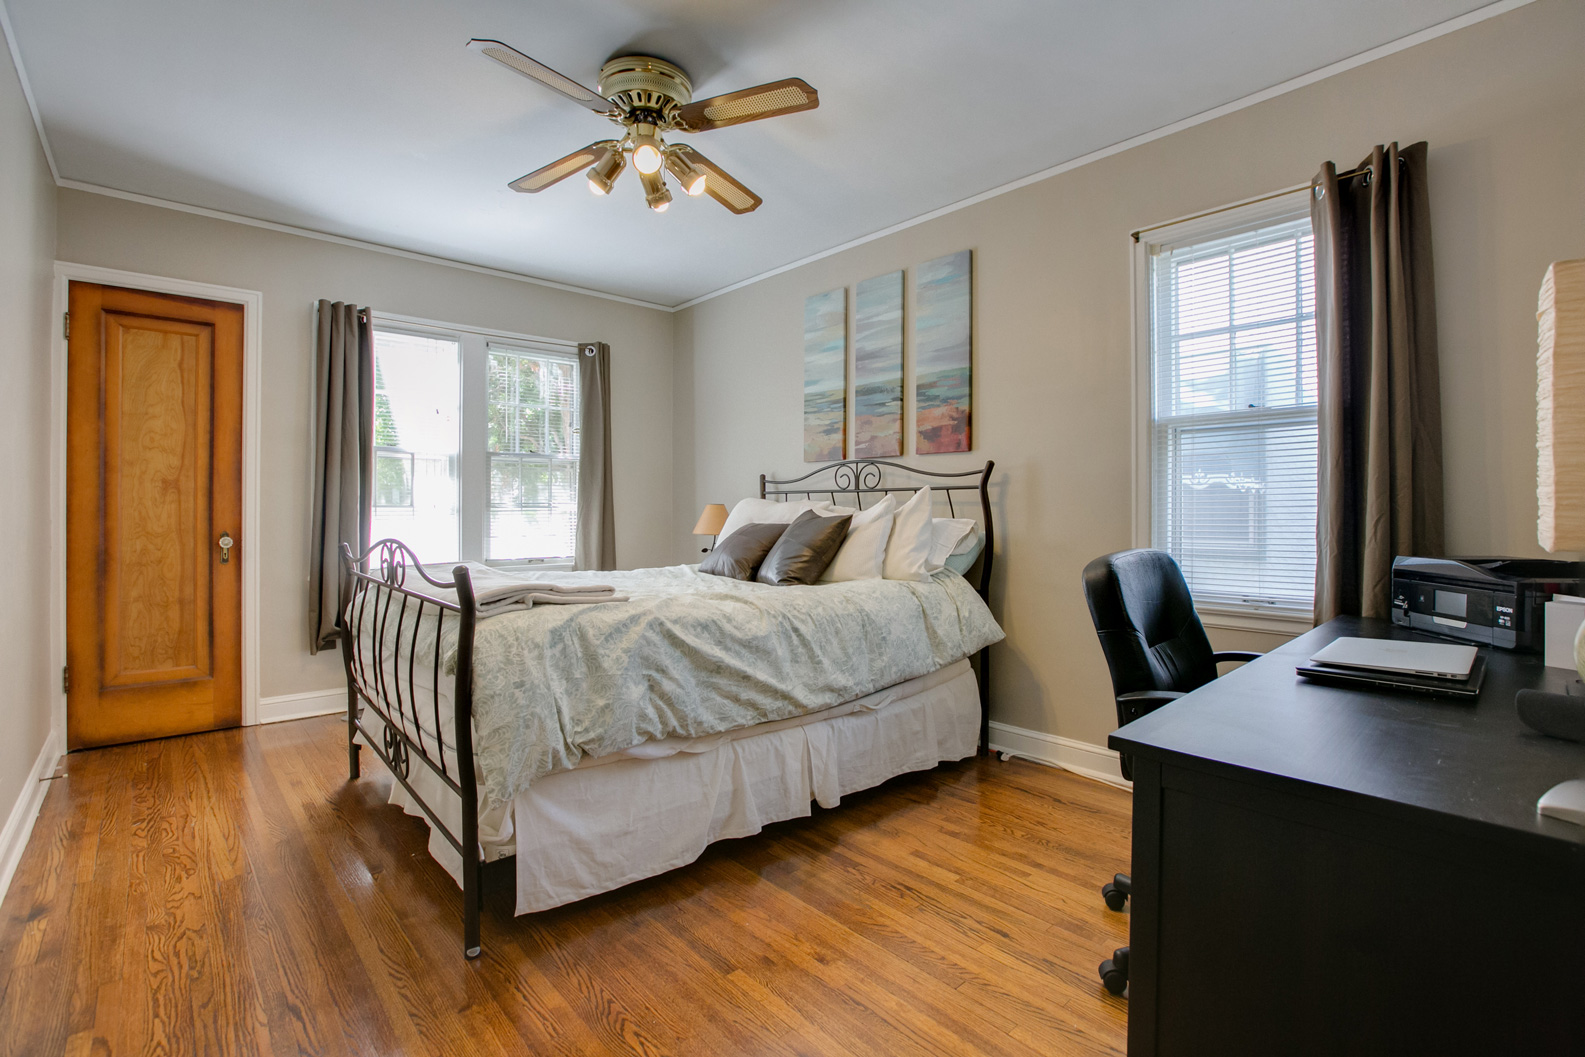 Bedroom 1, main level